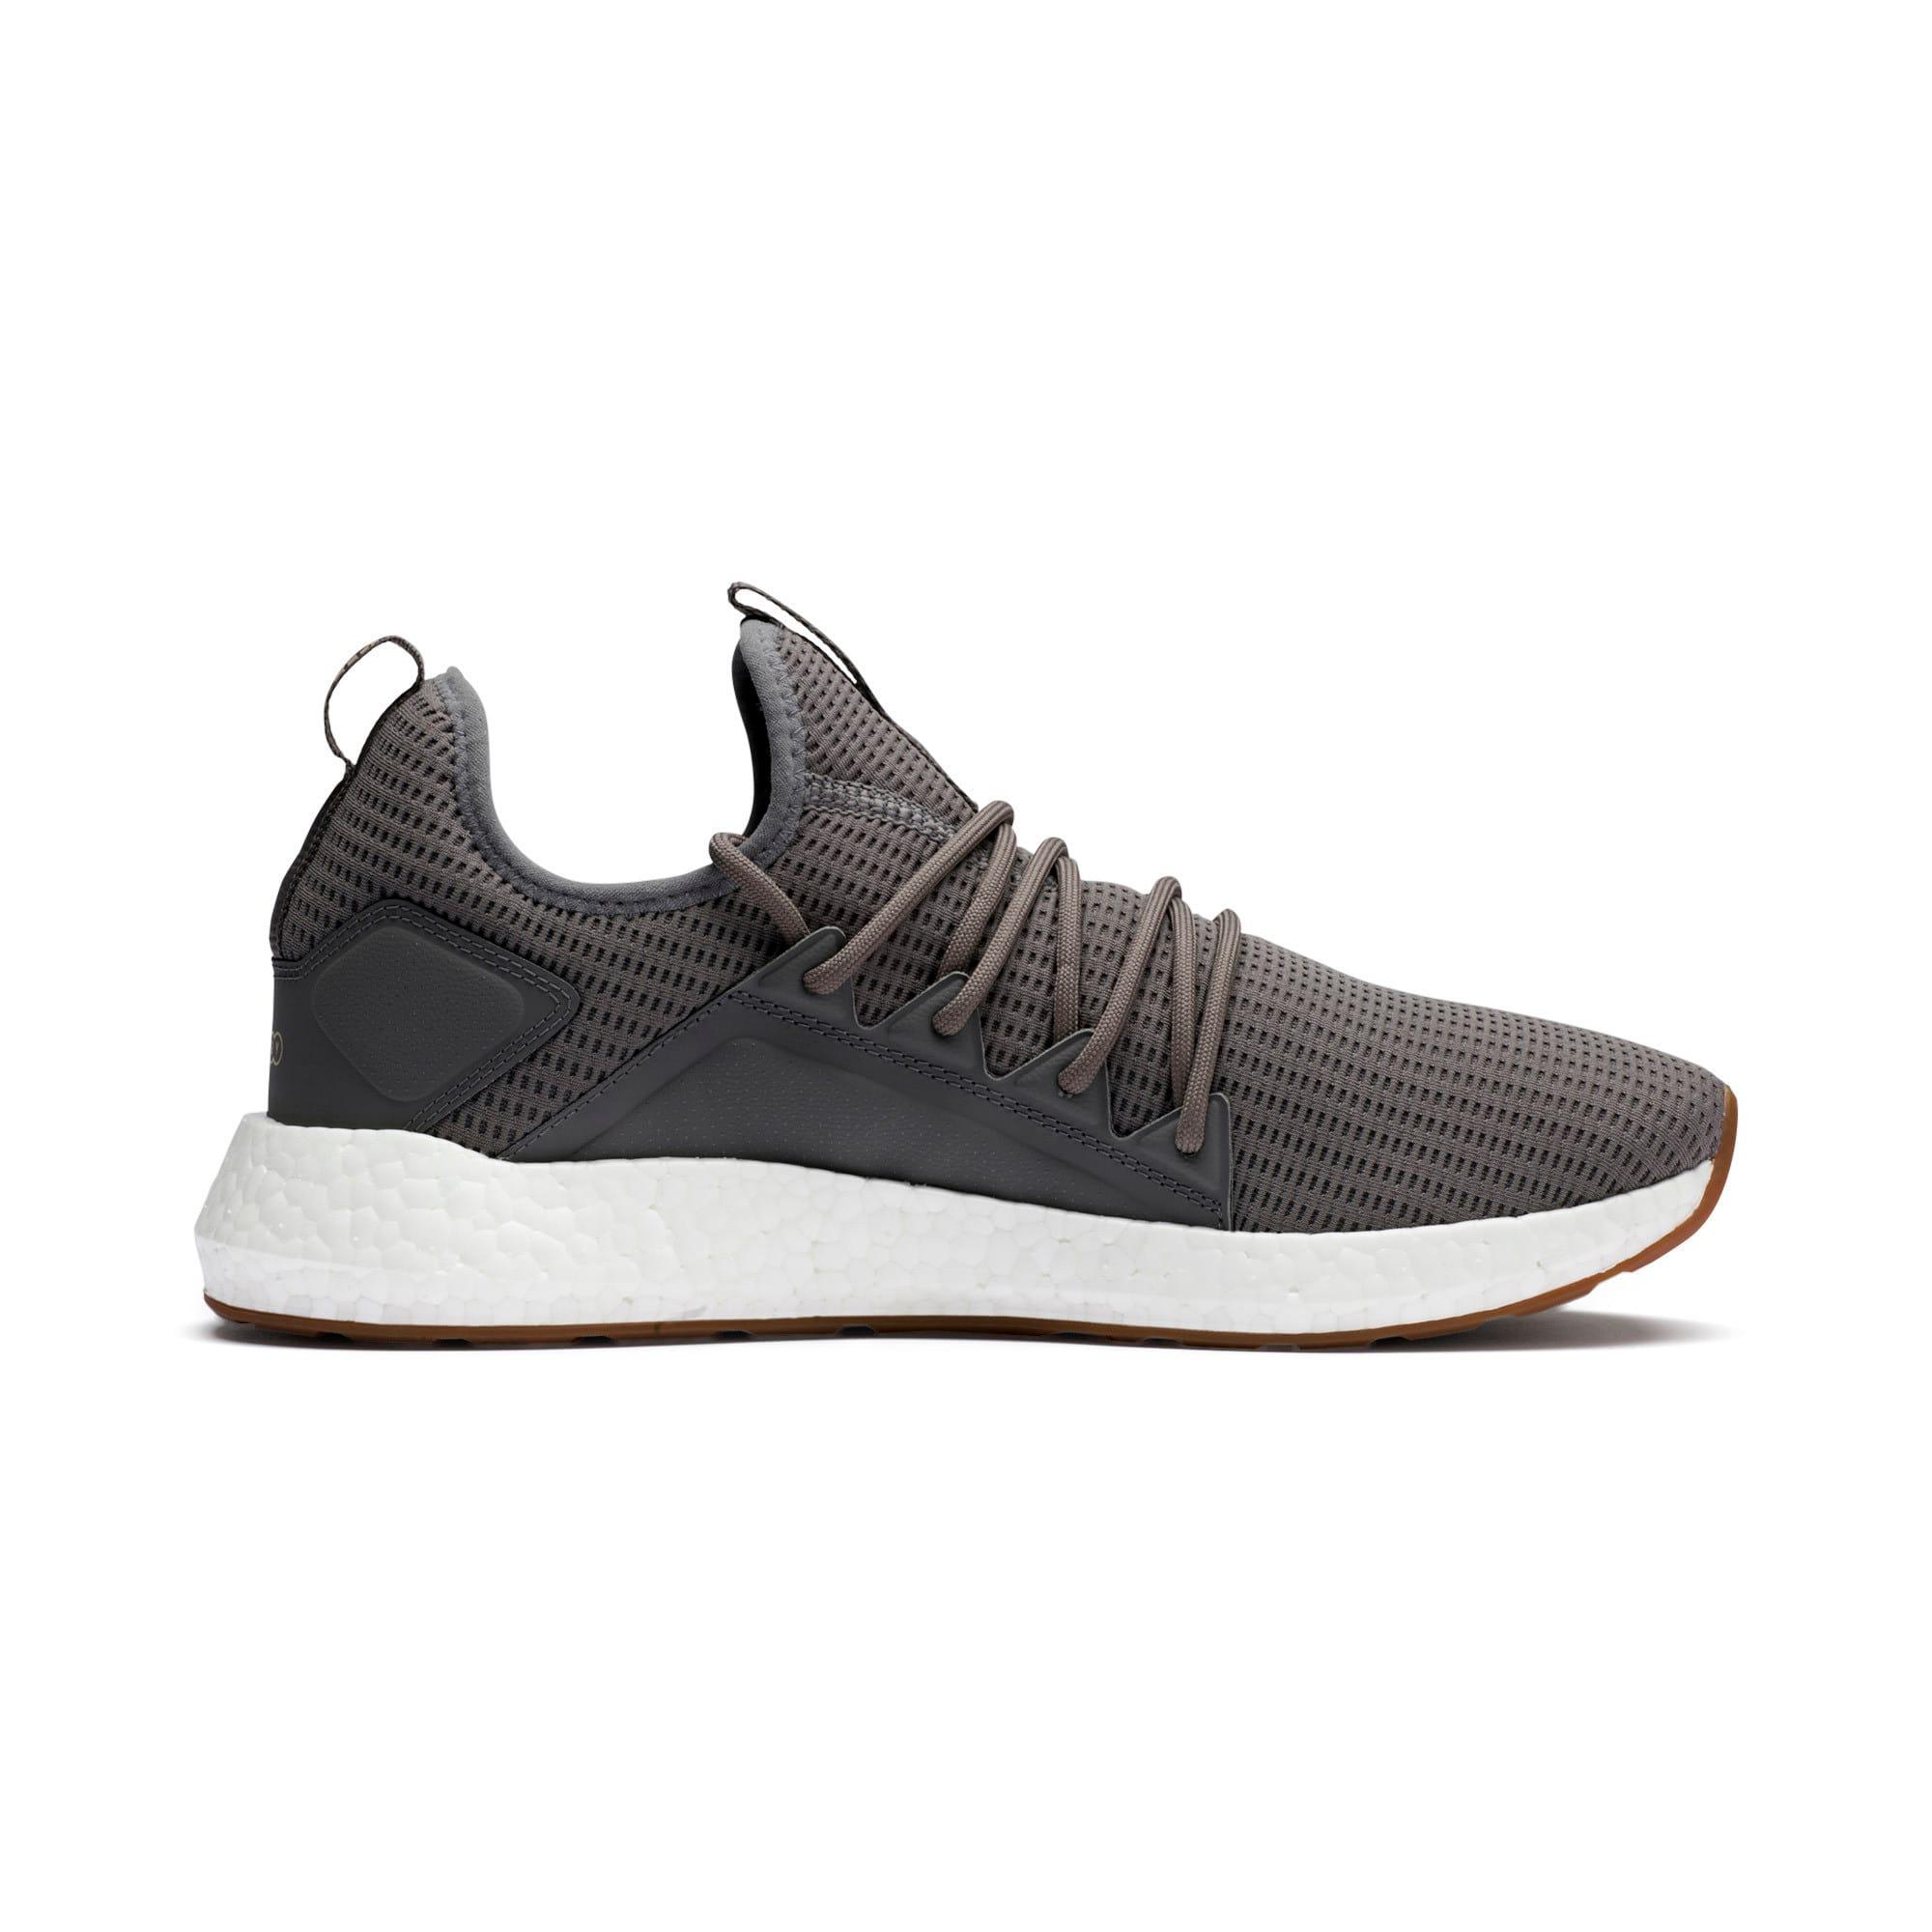 Thumbnail 5 of NRGY Neko Future Men's Running Shoes, Charcoal Gray-Taos Taupe, medium